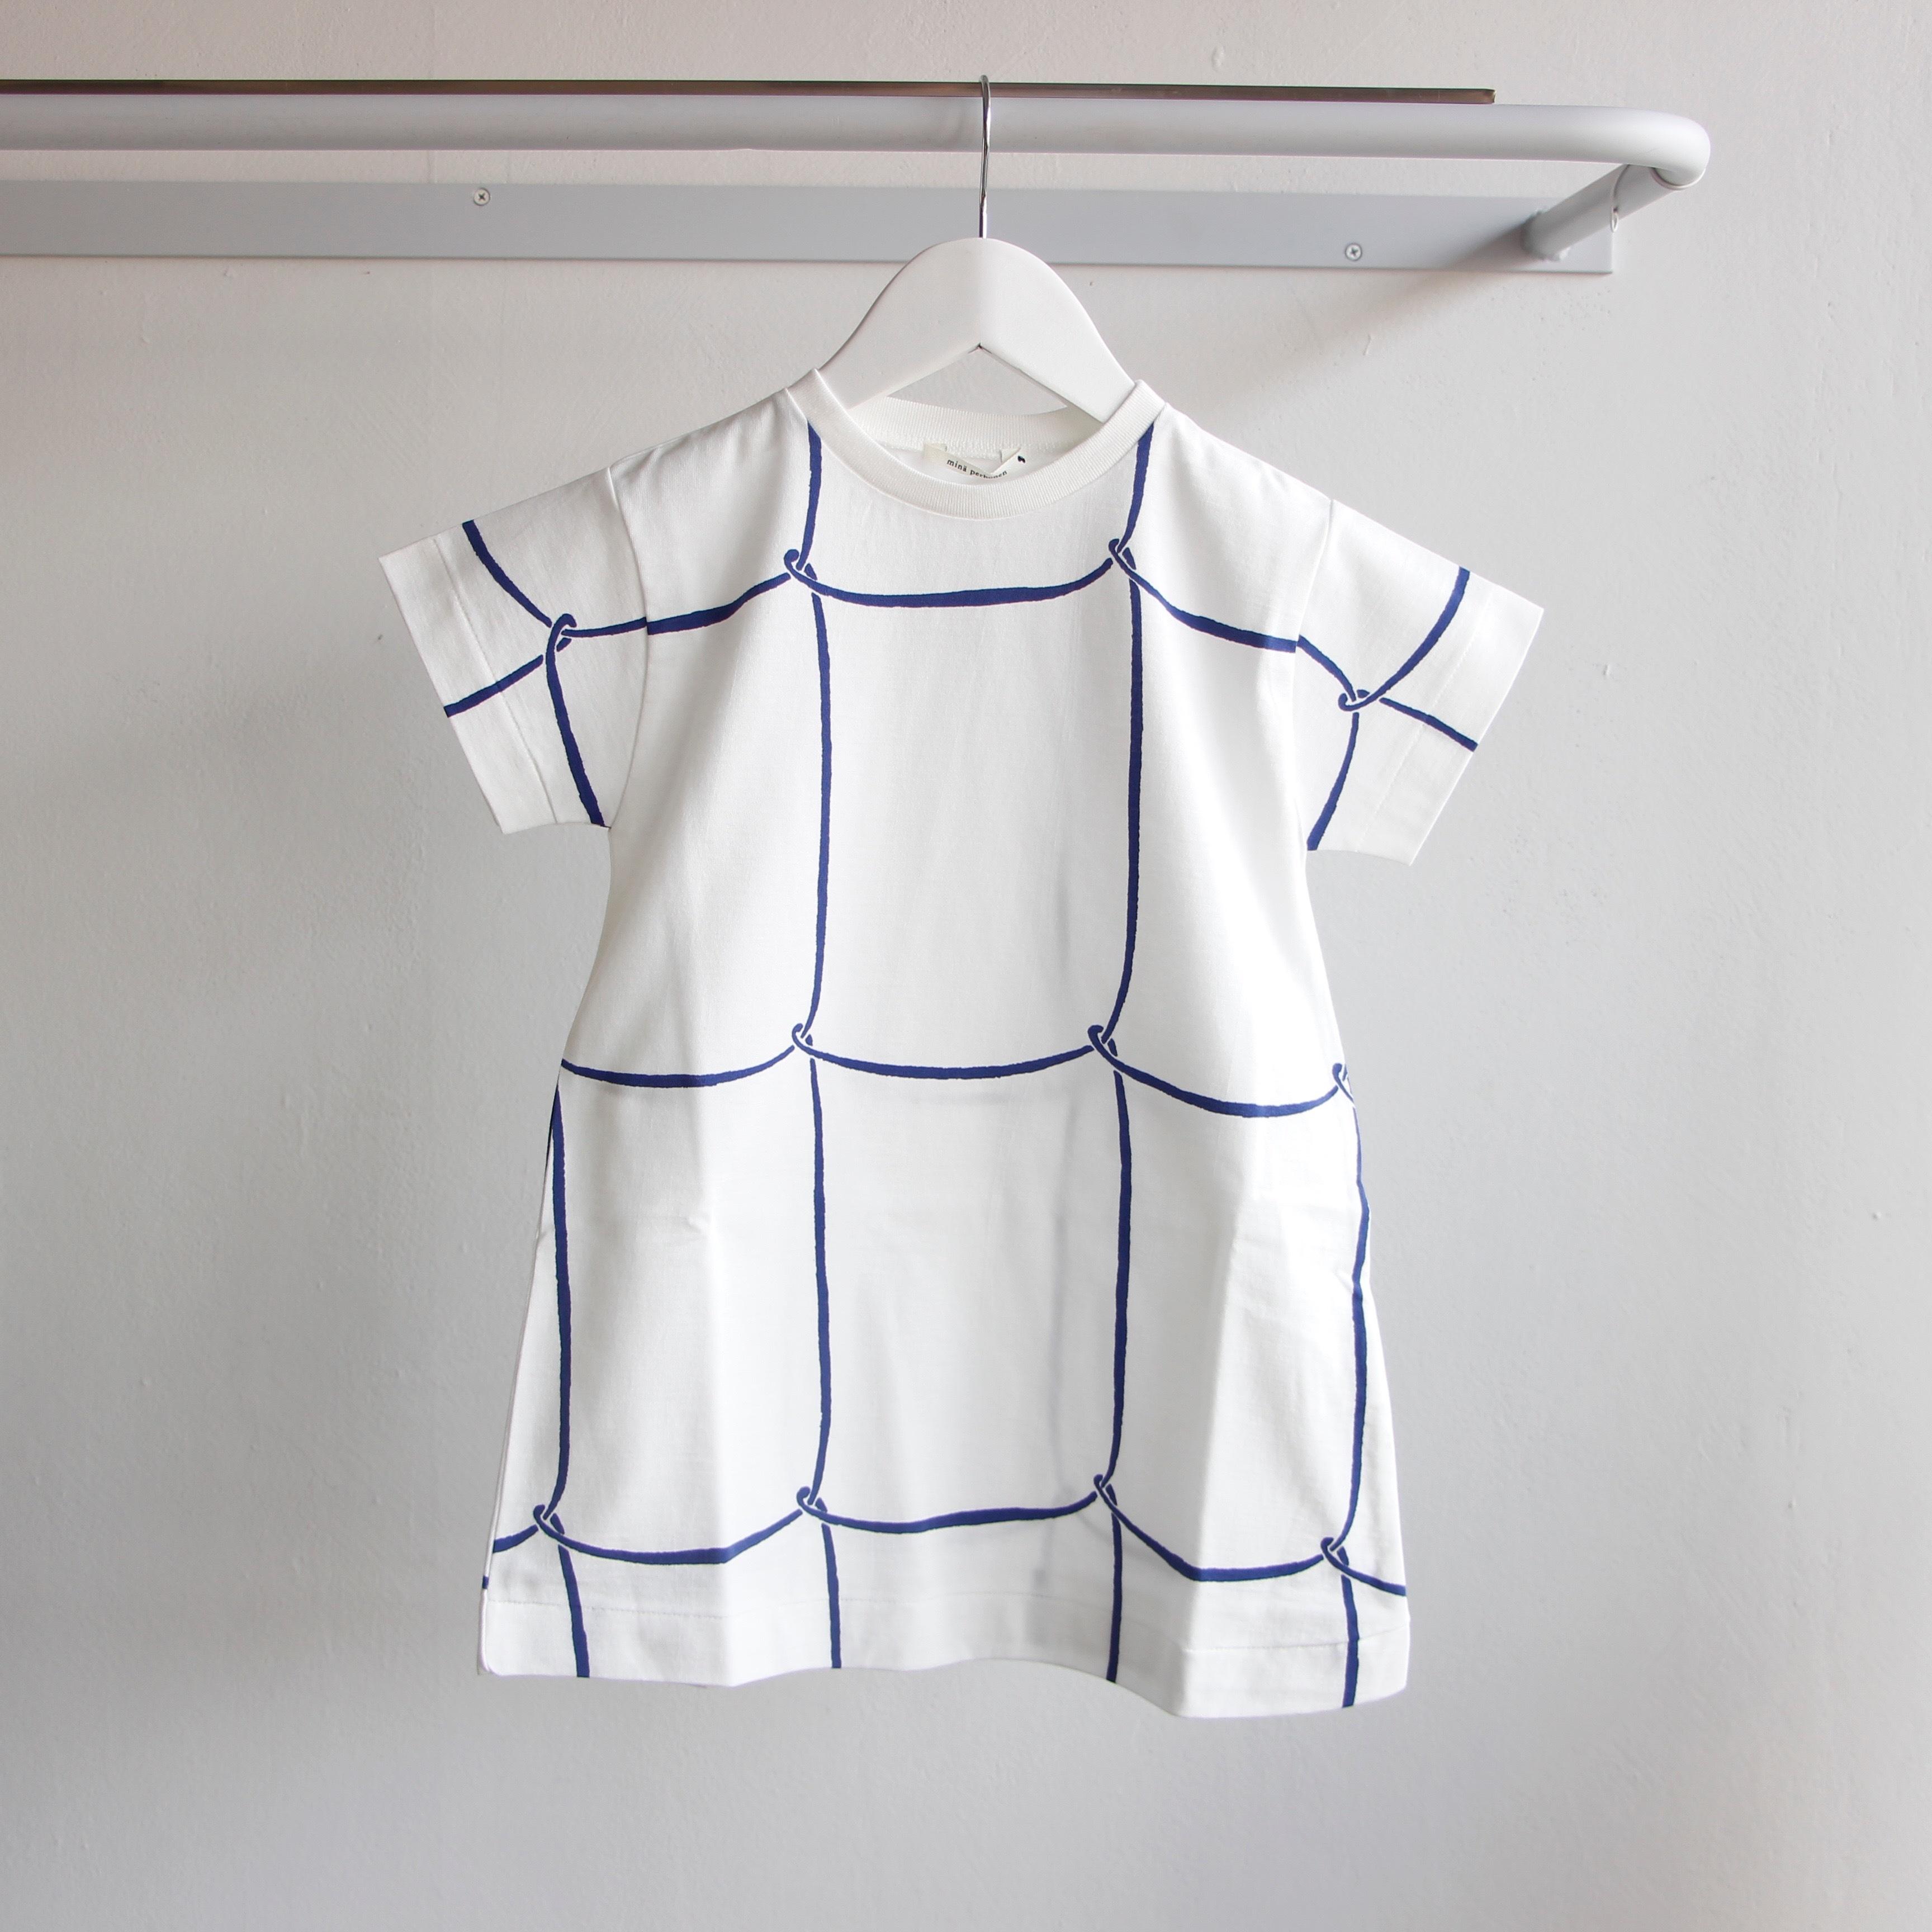 《mina perhonen 2018SS》ribbon frame ワンピース / white / 80-100cm